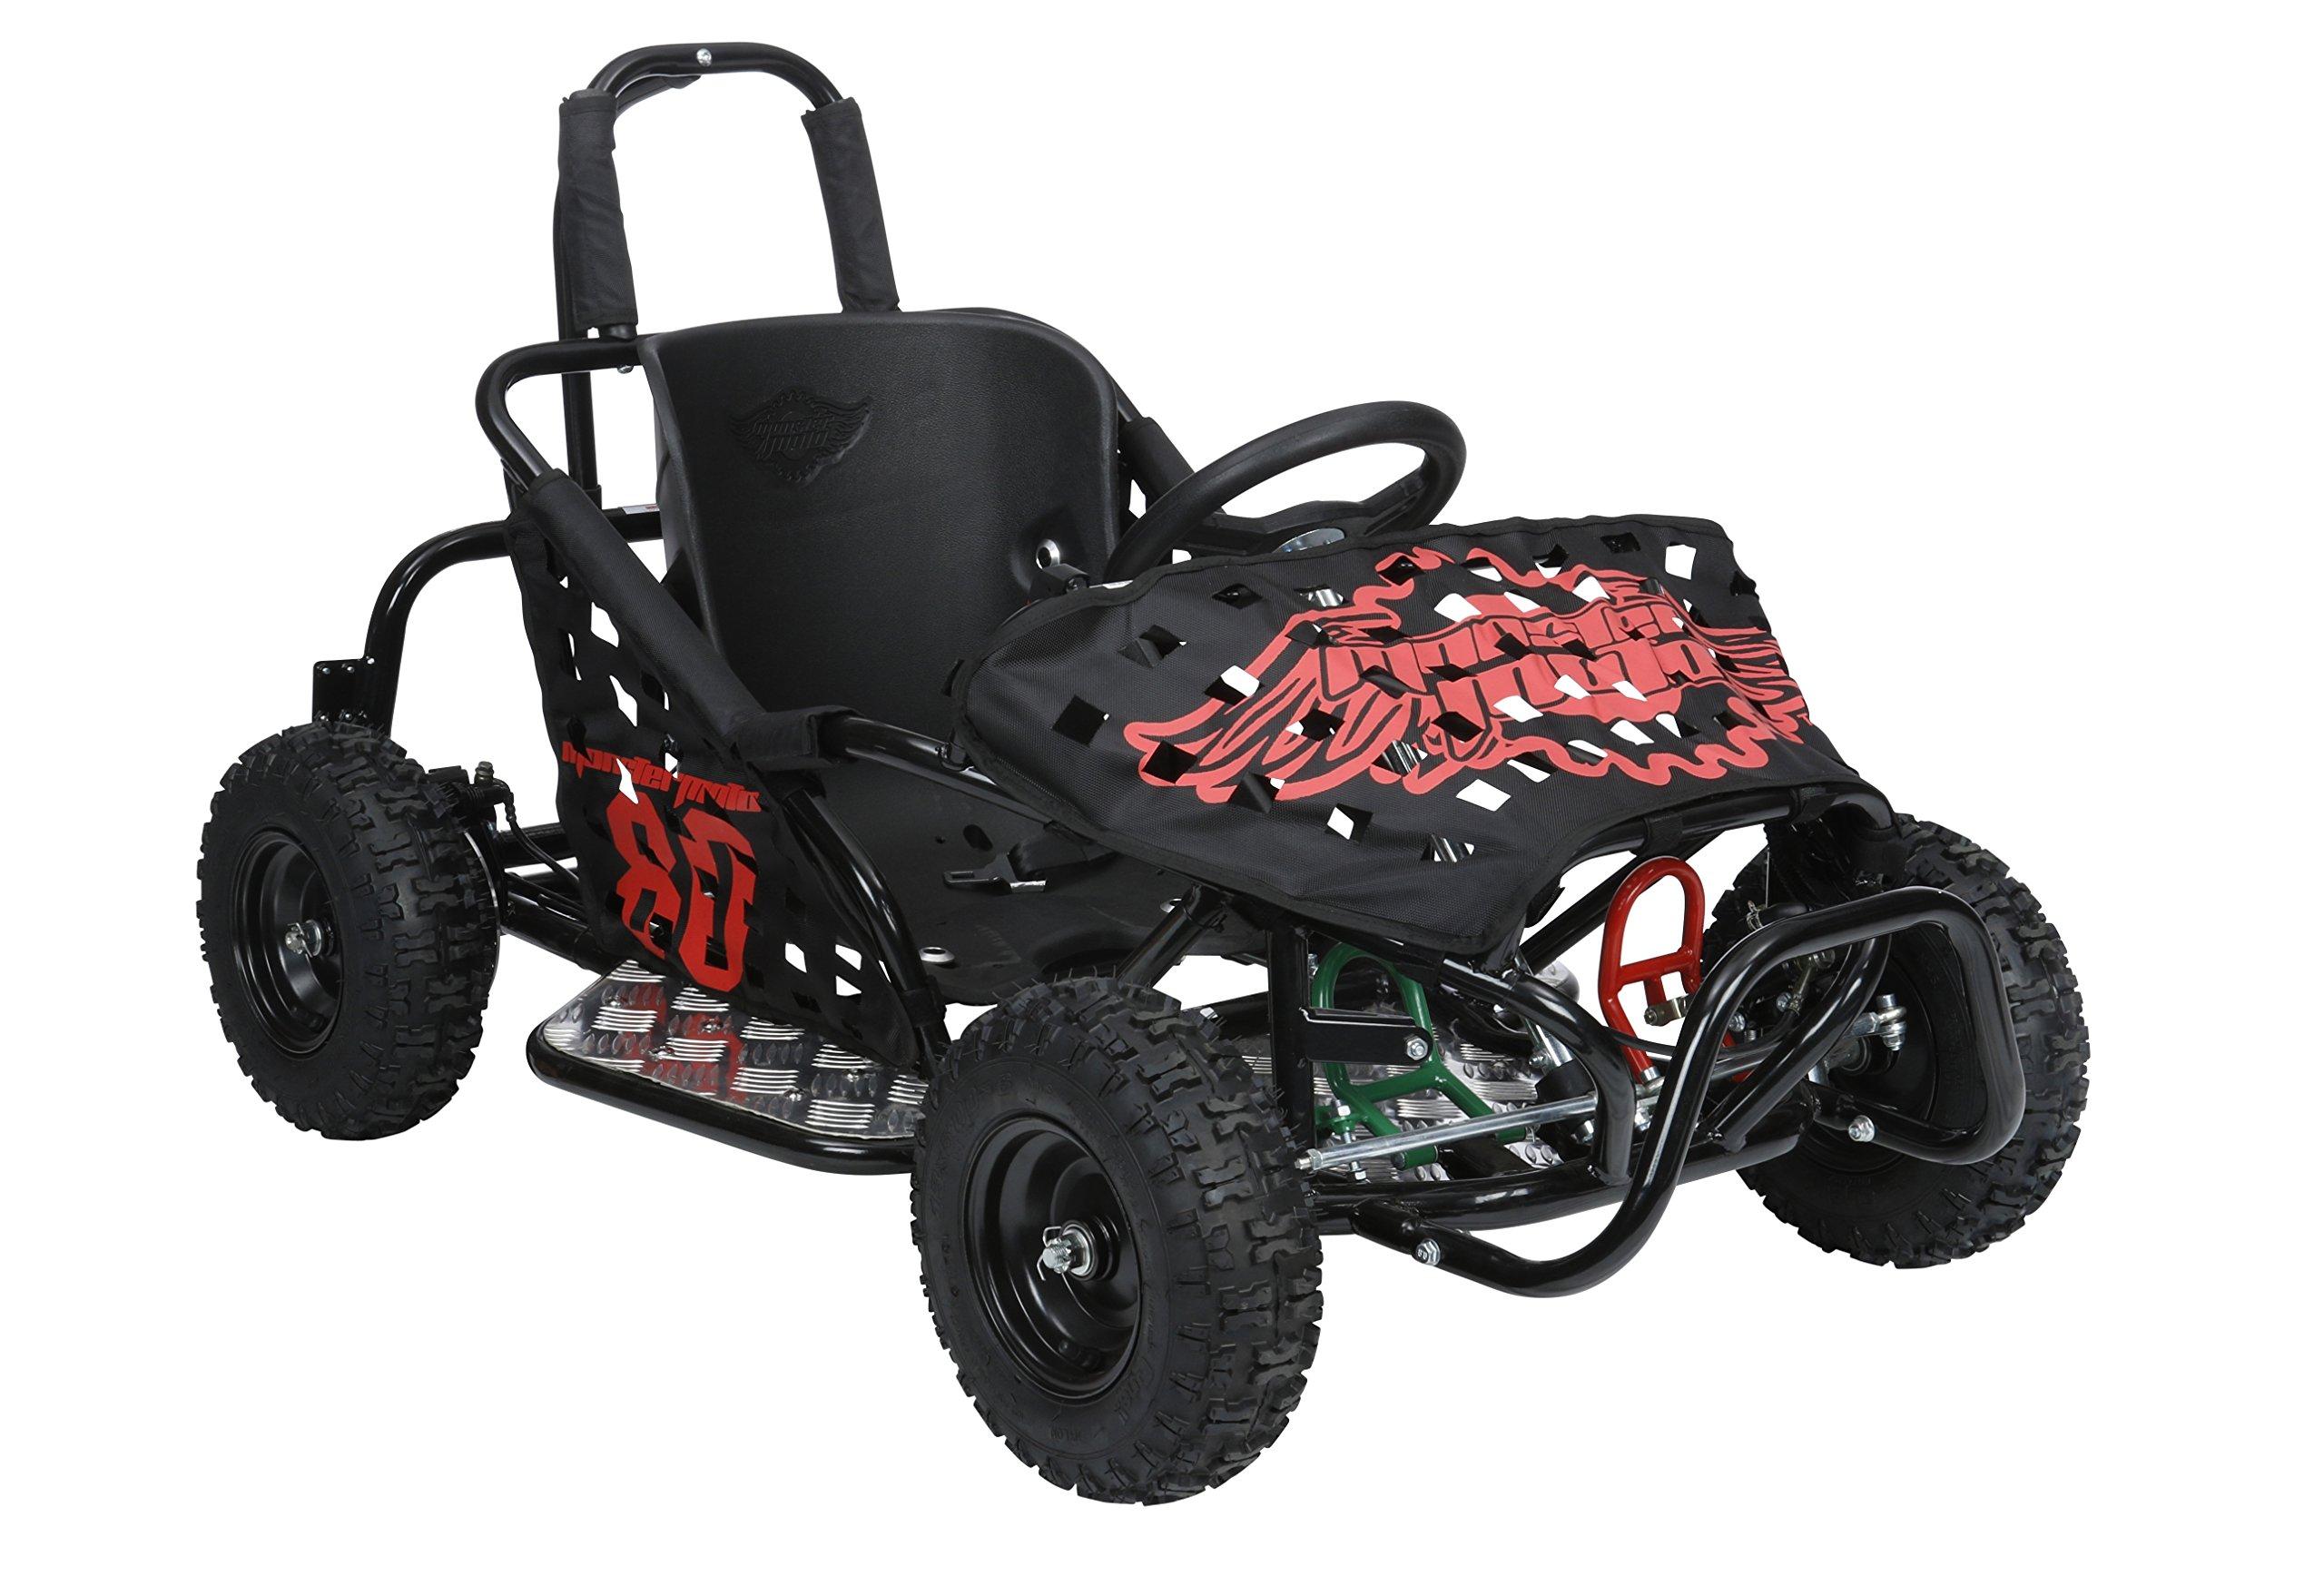 Monster Moto MM-K80-BR Black Frame with Red Graphics Go Kart by Monster Moto (Image #2)